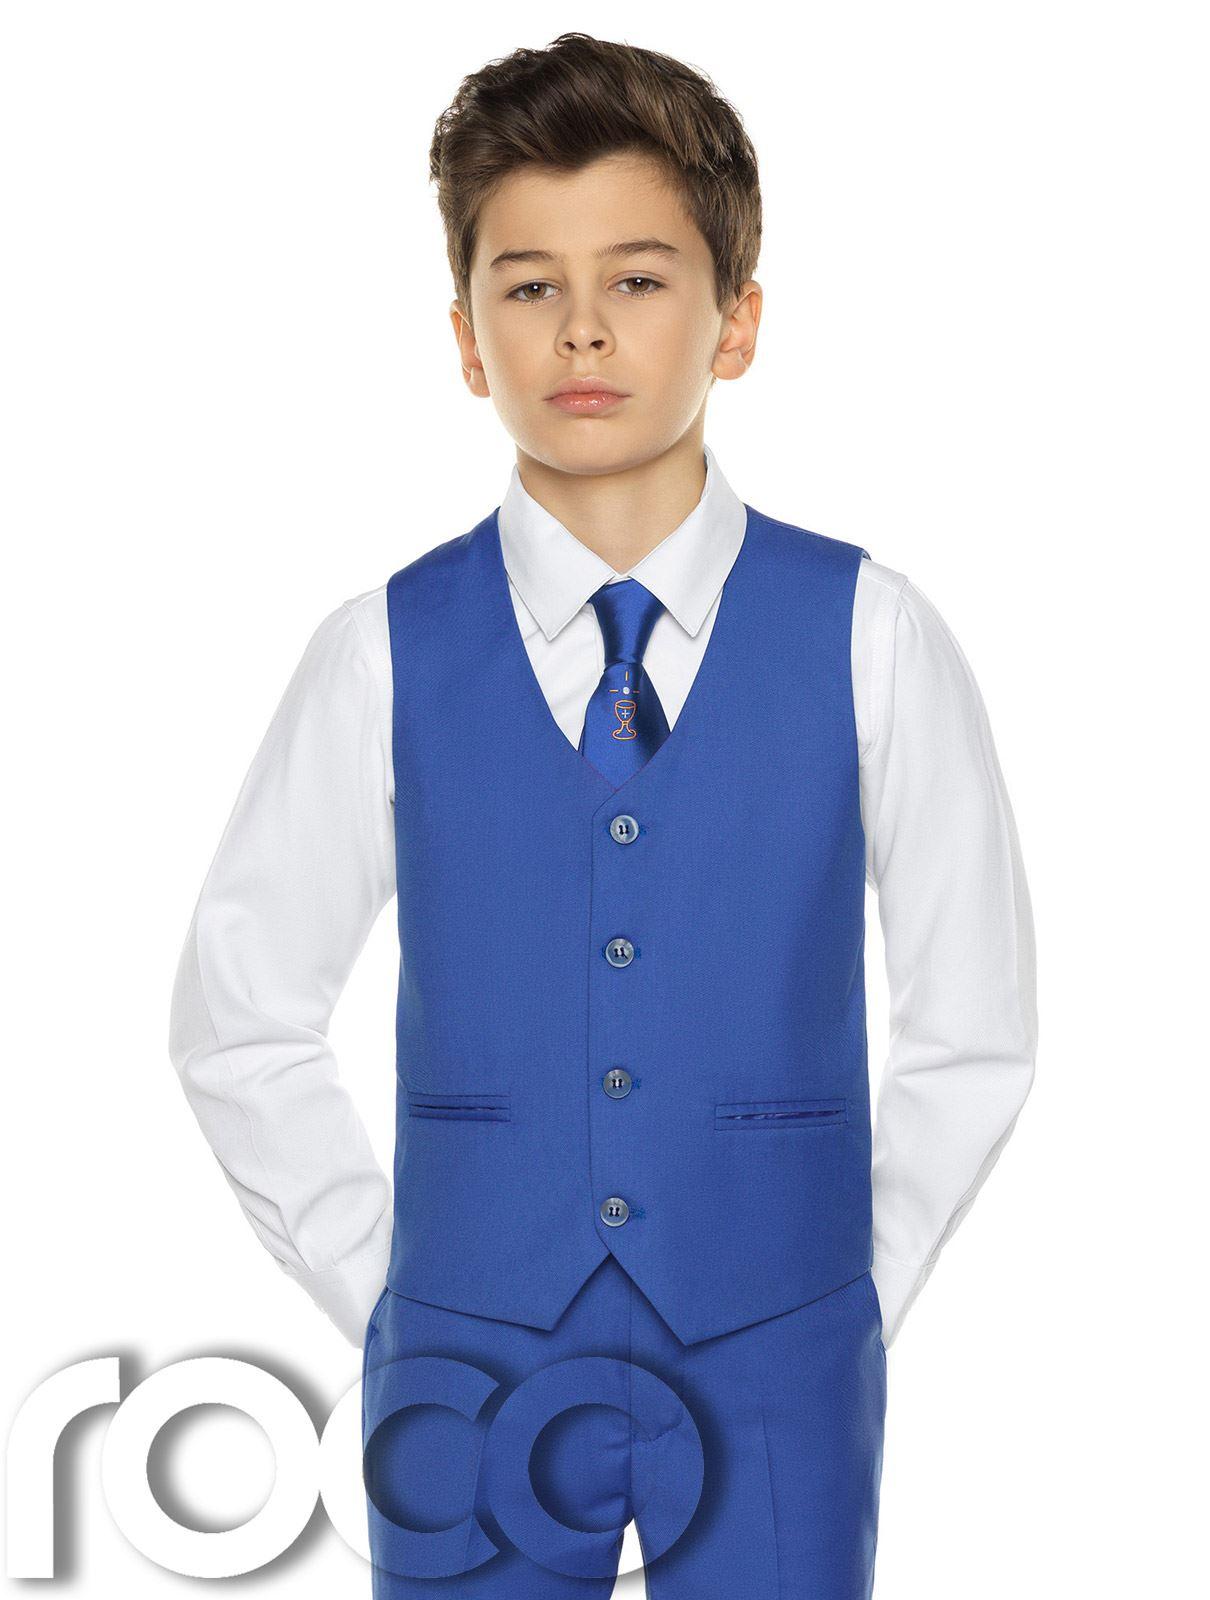 Garcons-Costume-Bleu-Communion-Costume-Bleu-Communion-Costume miniature 7